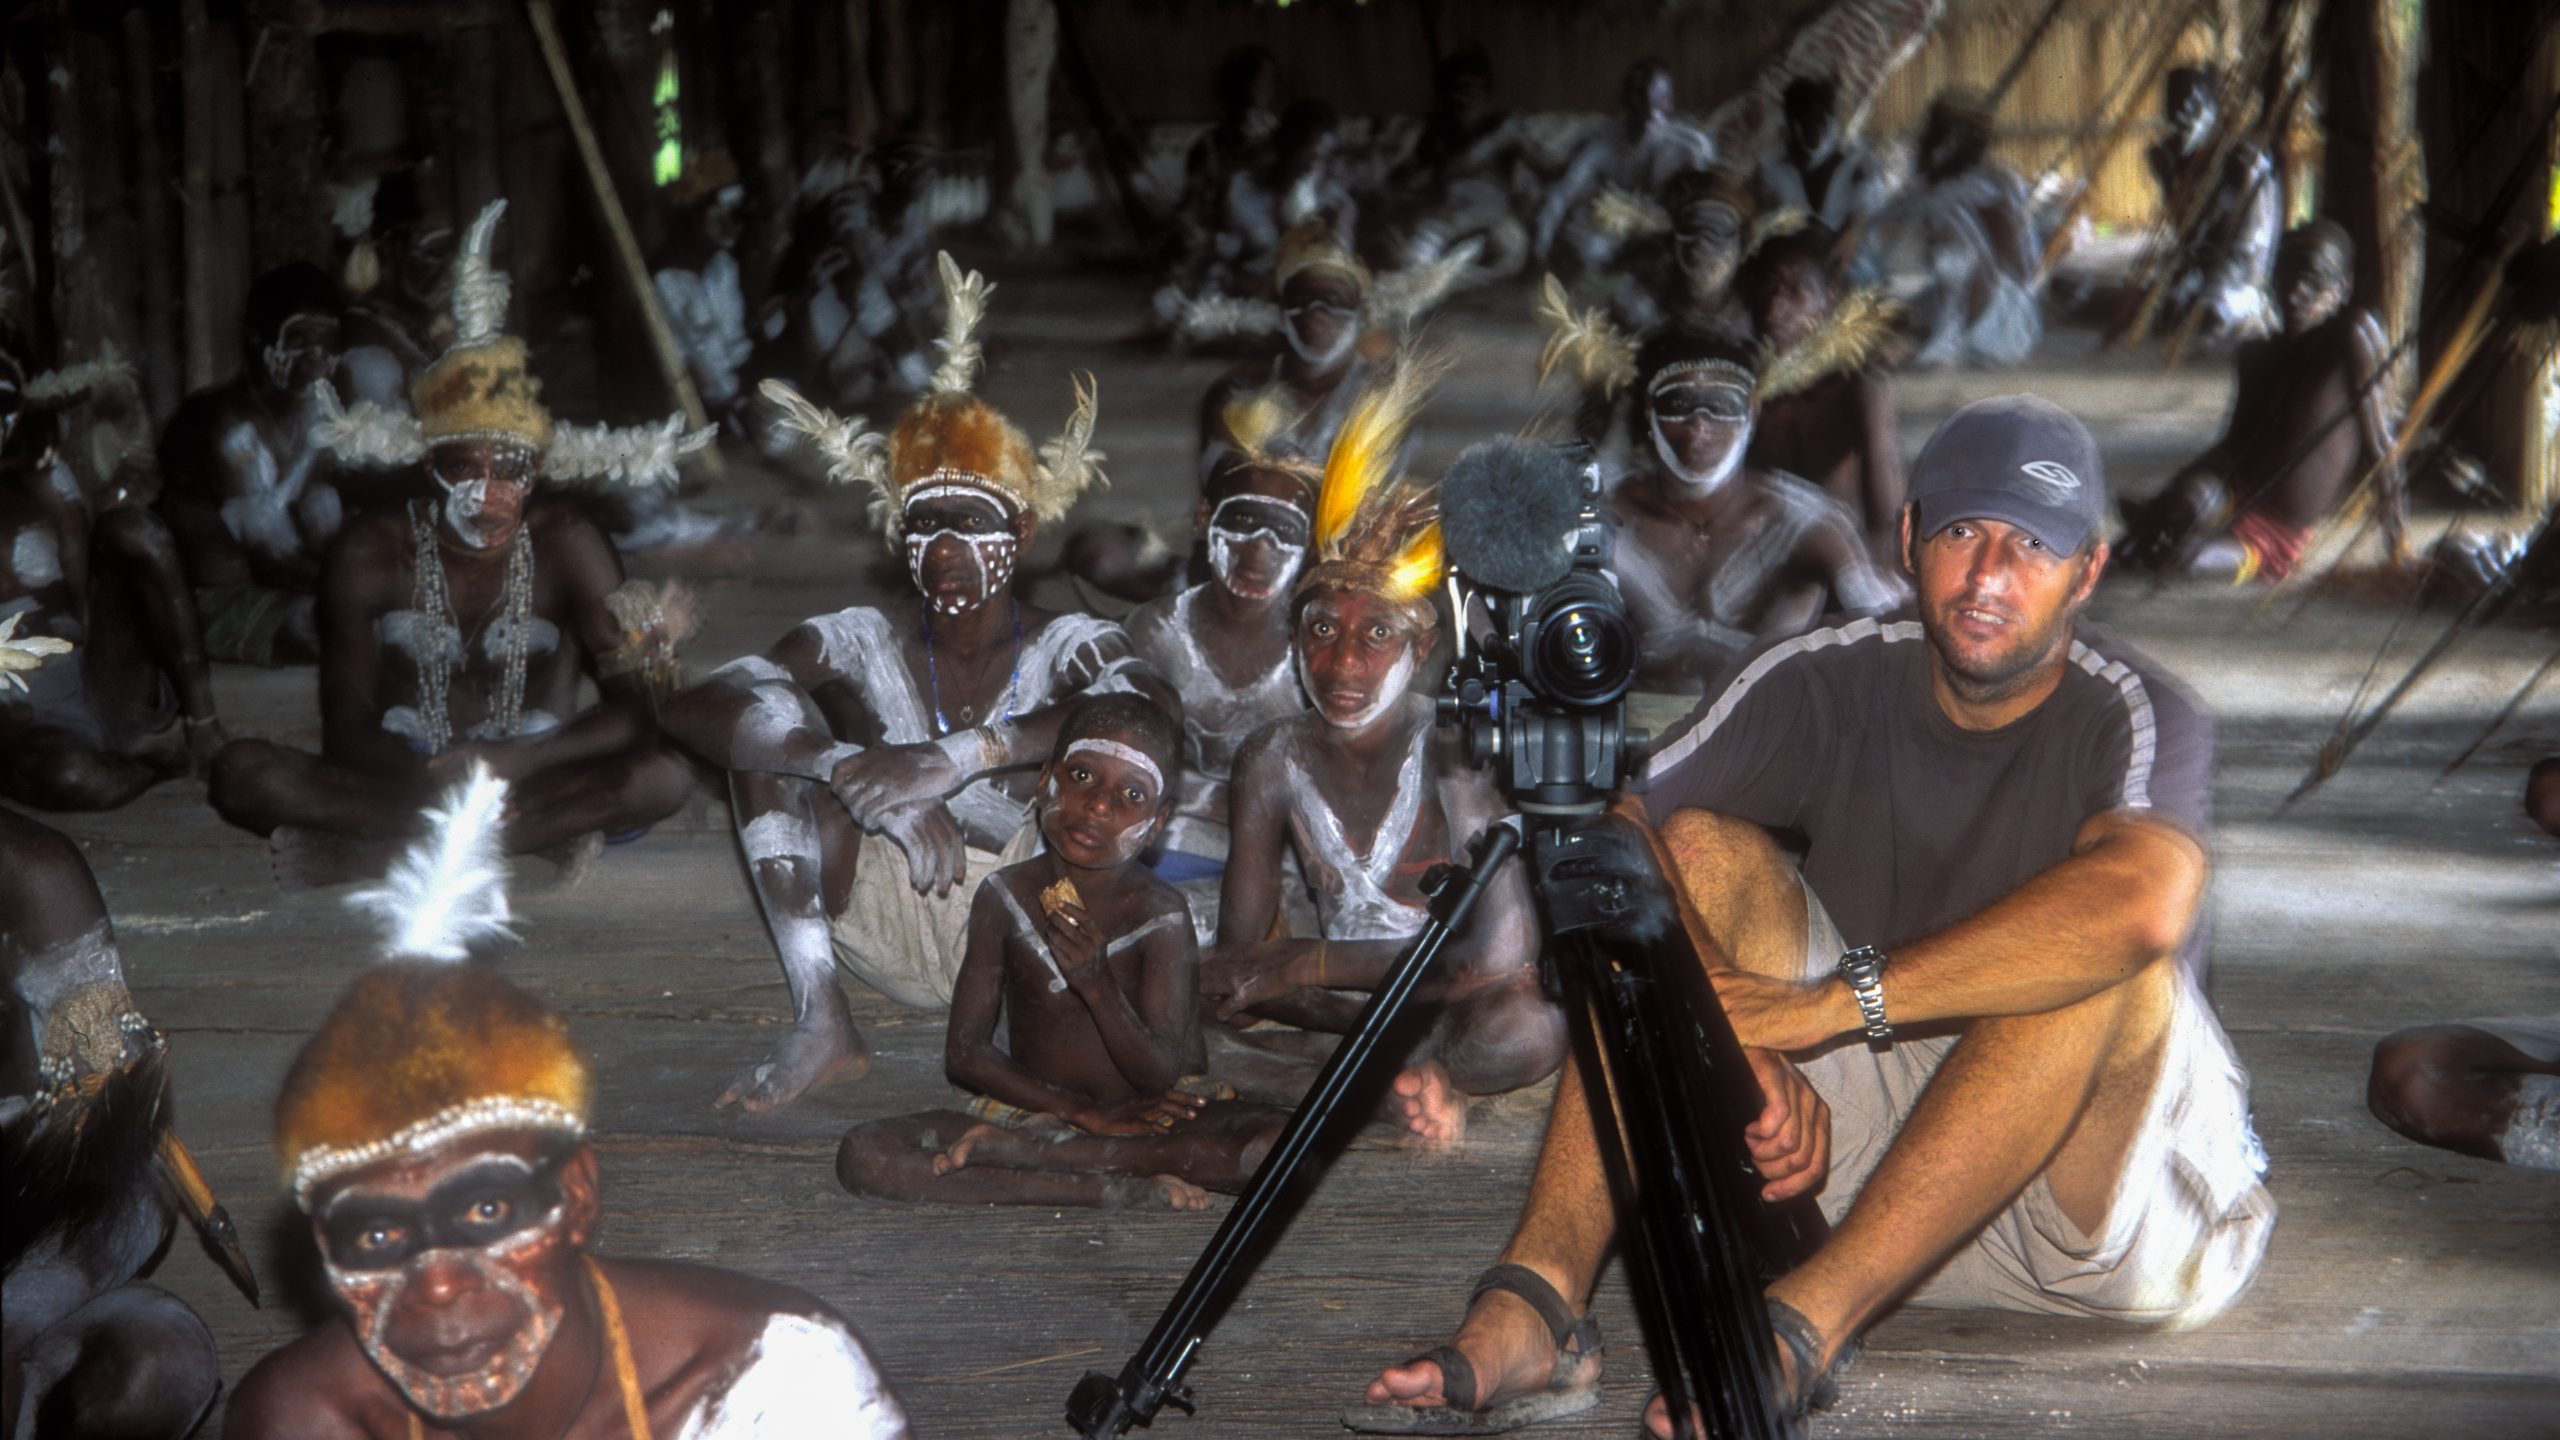 Tim Butt Cameraman West Papua Asmat Tribe BBC